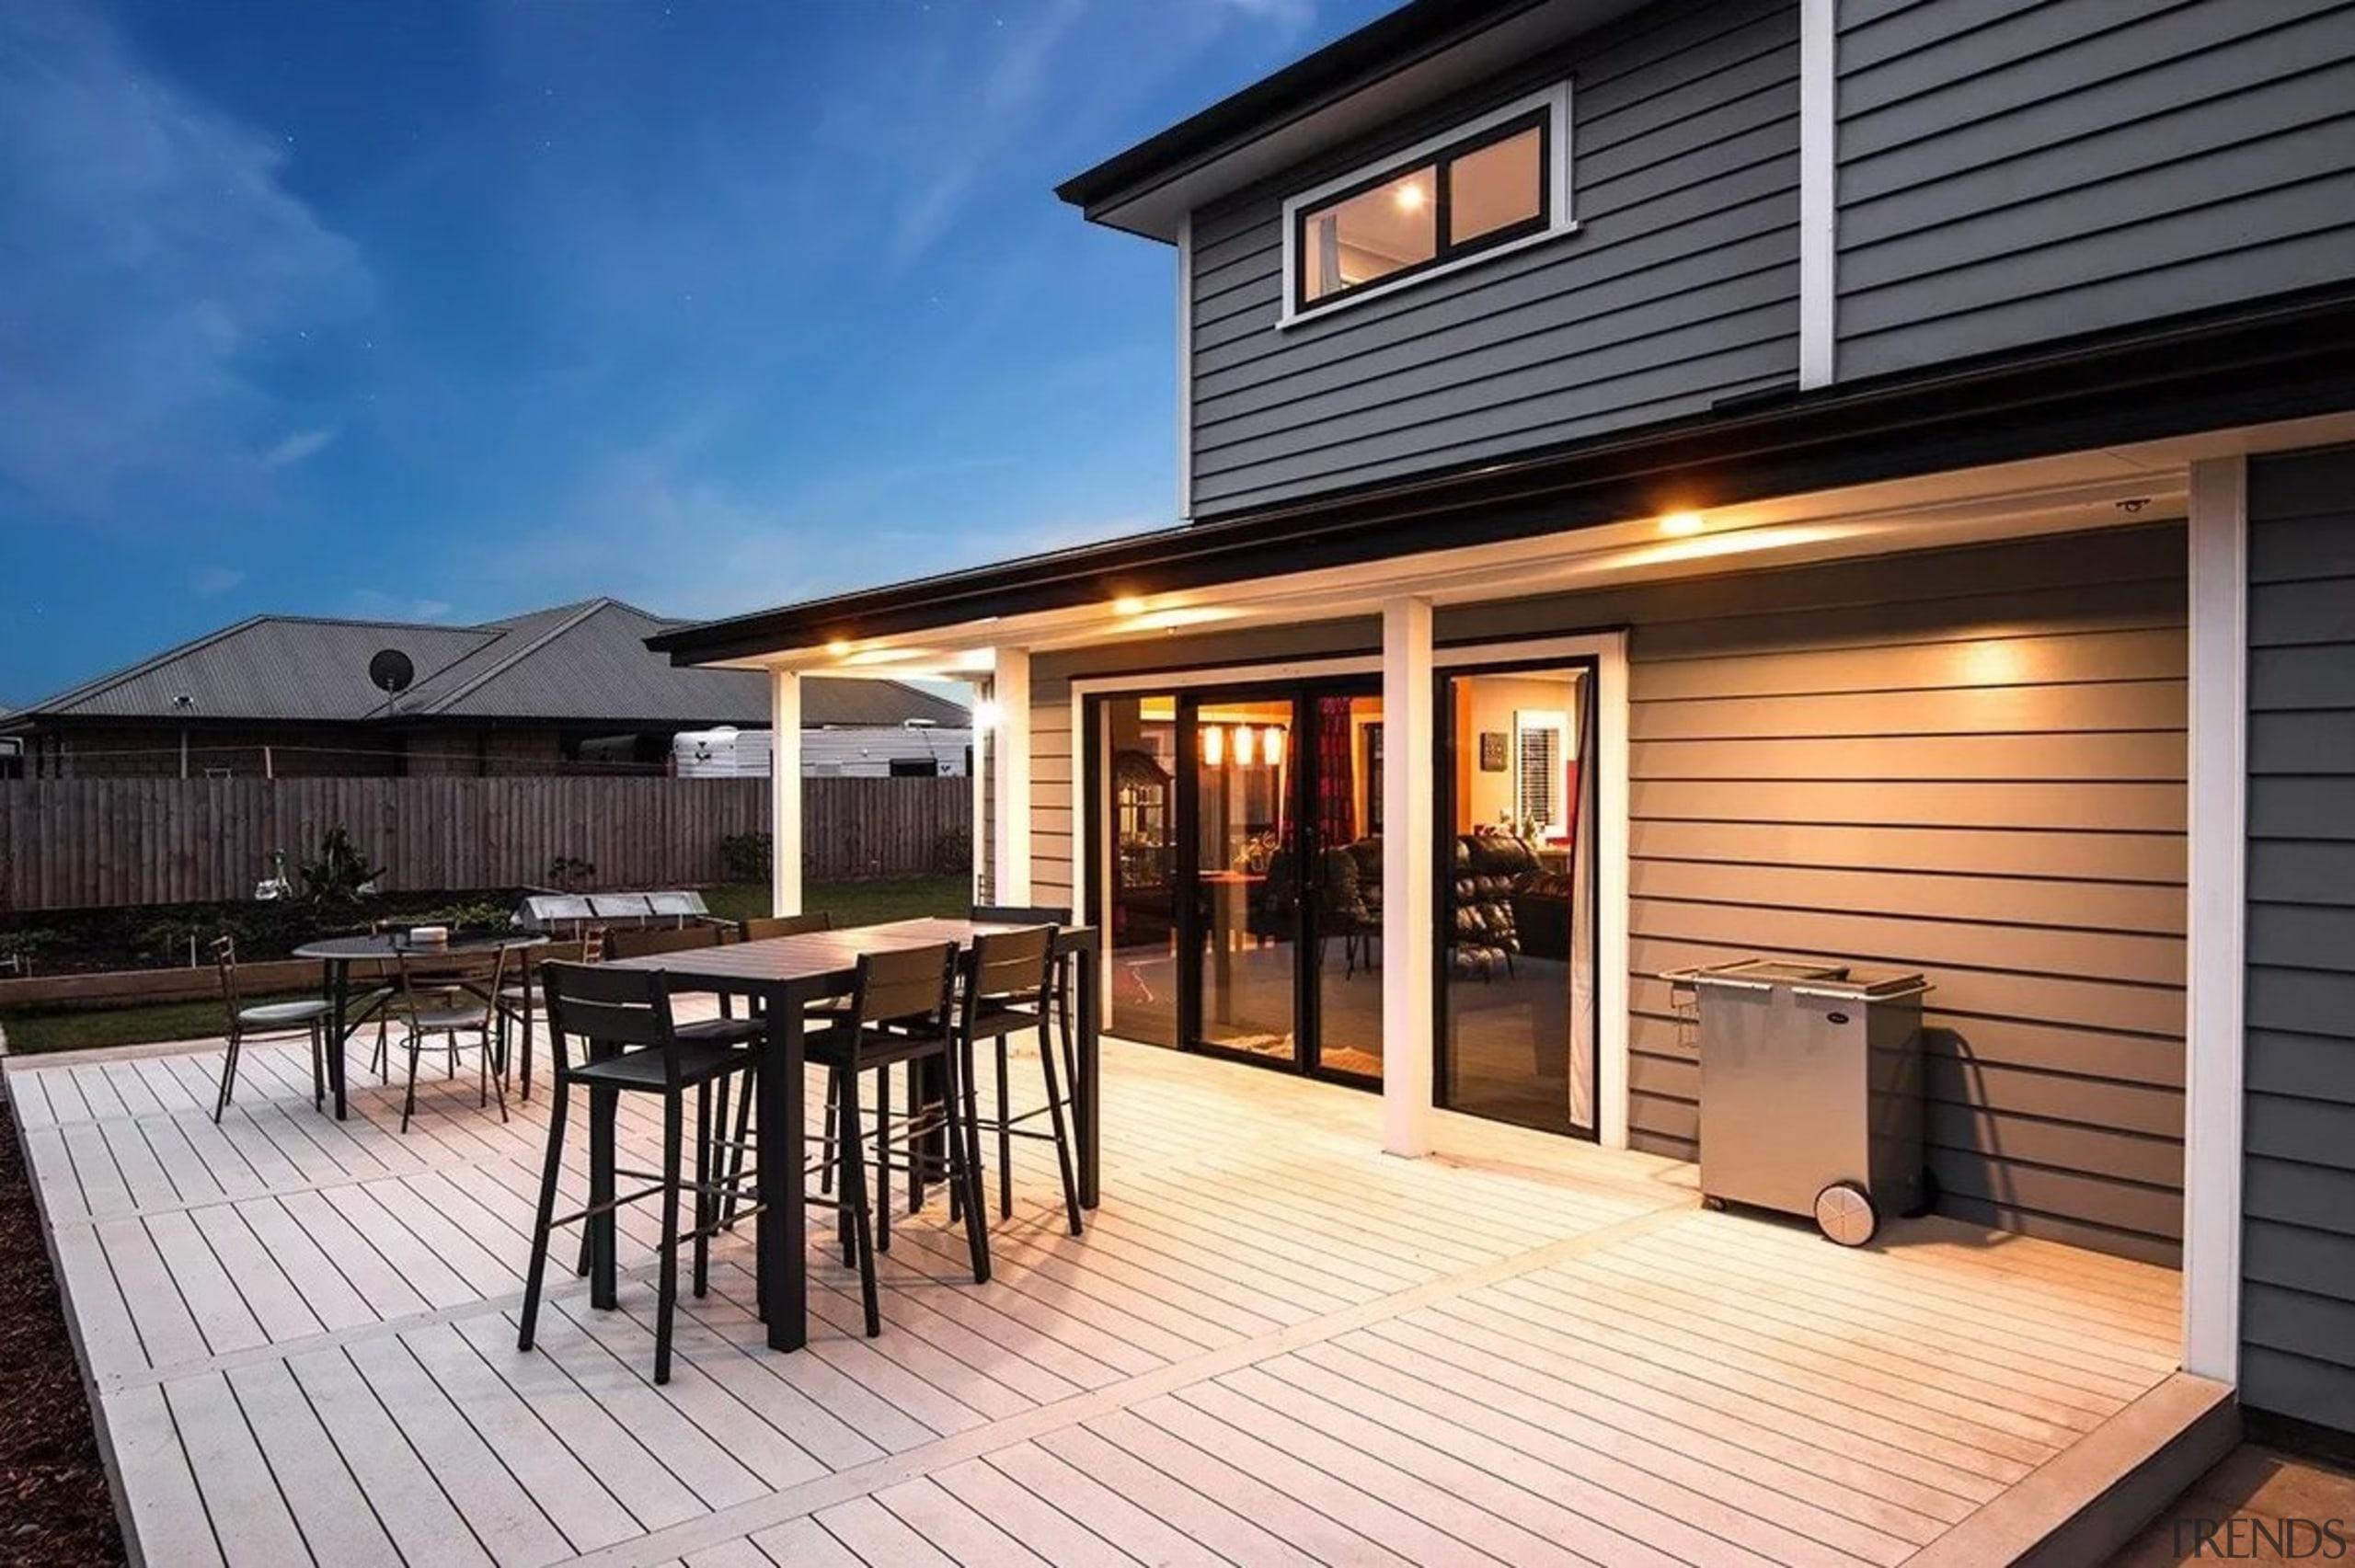 Envira bevel back weatherboards - Envira bevel back deck, home, house, outdoor structure, property, real estate, siding, window, black